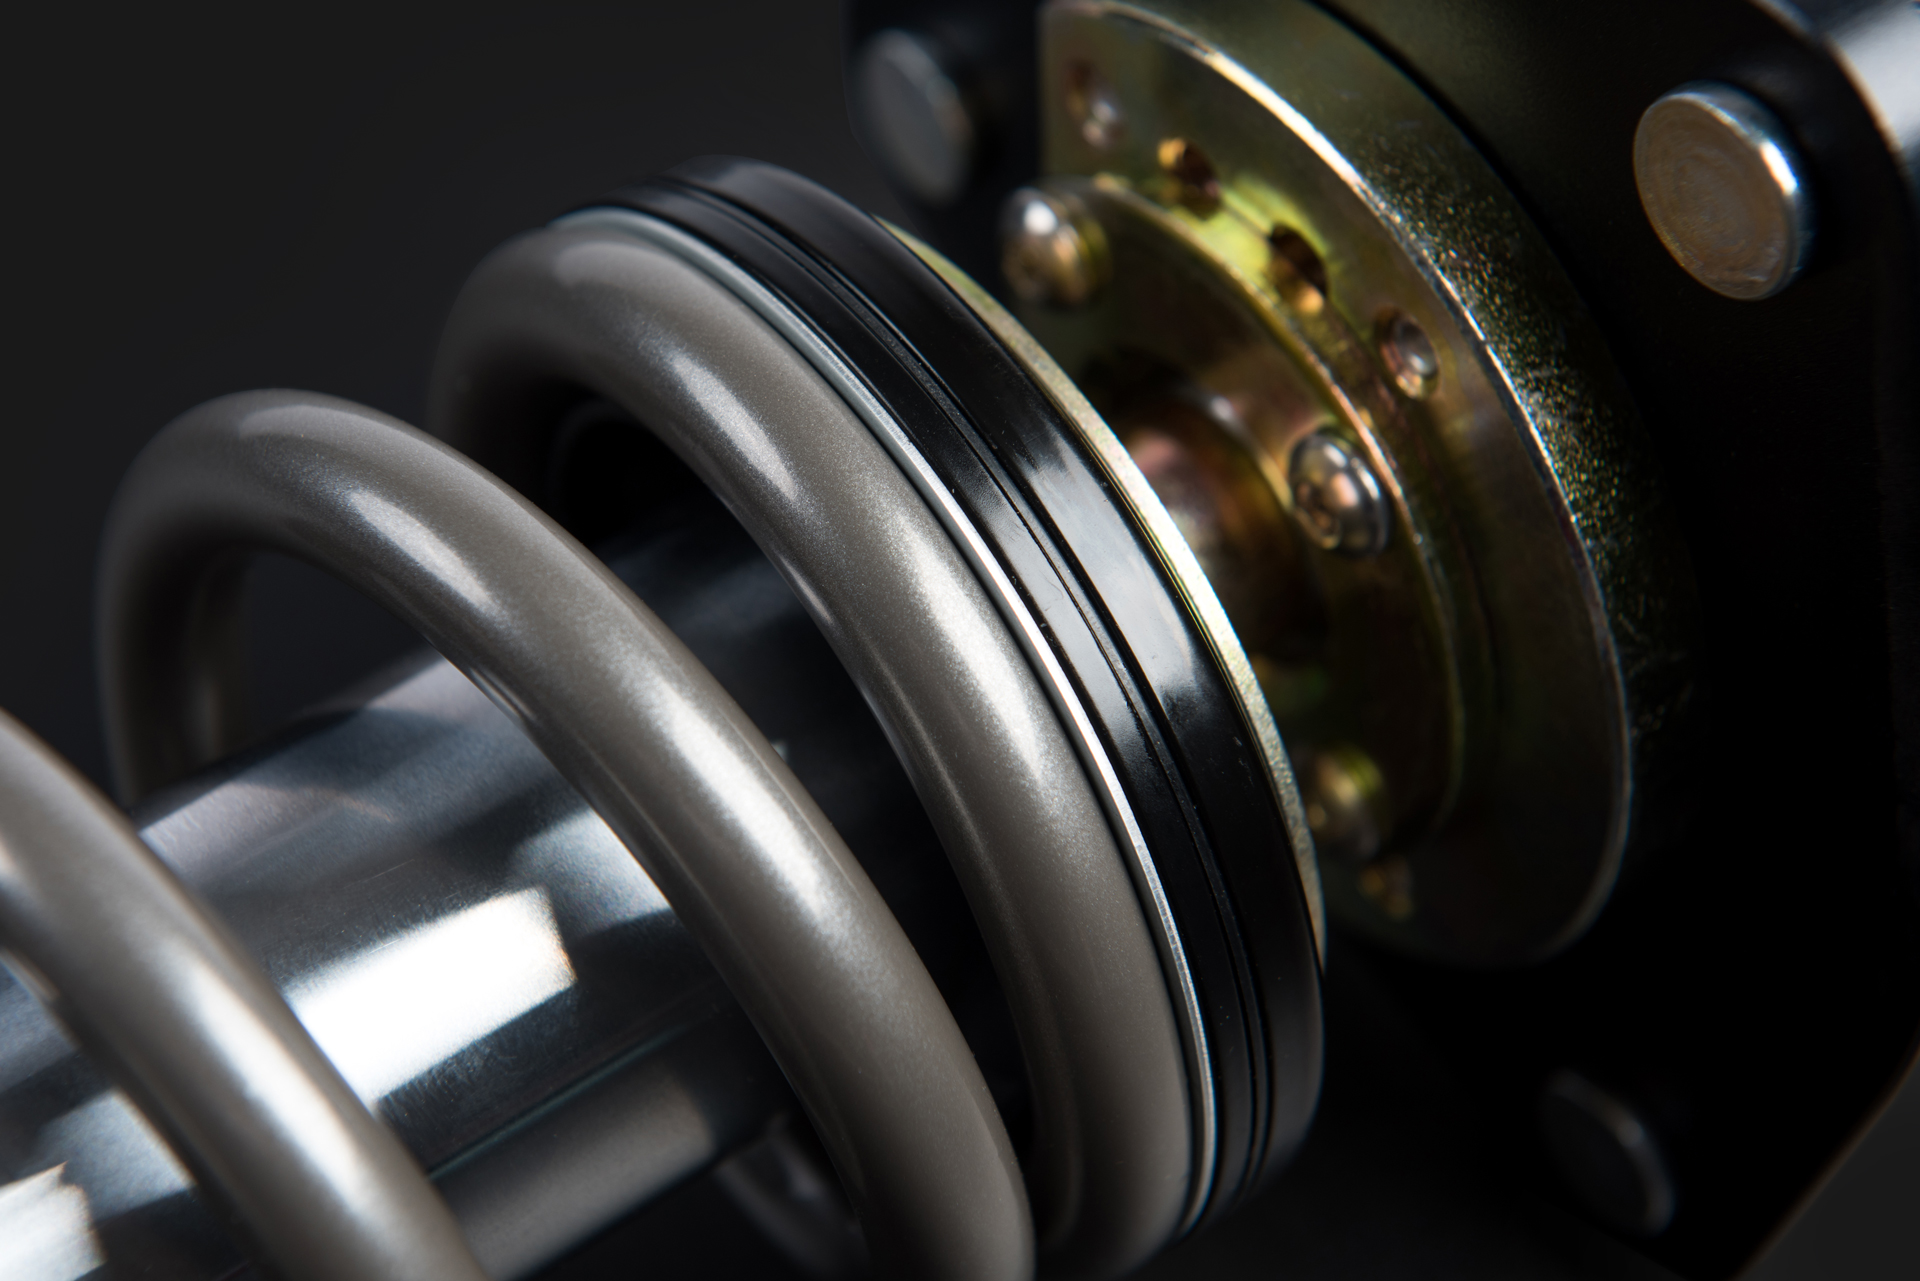 Sealed Roller Bearing Spring Seat Stance Suspension